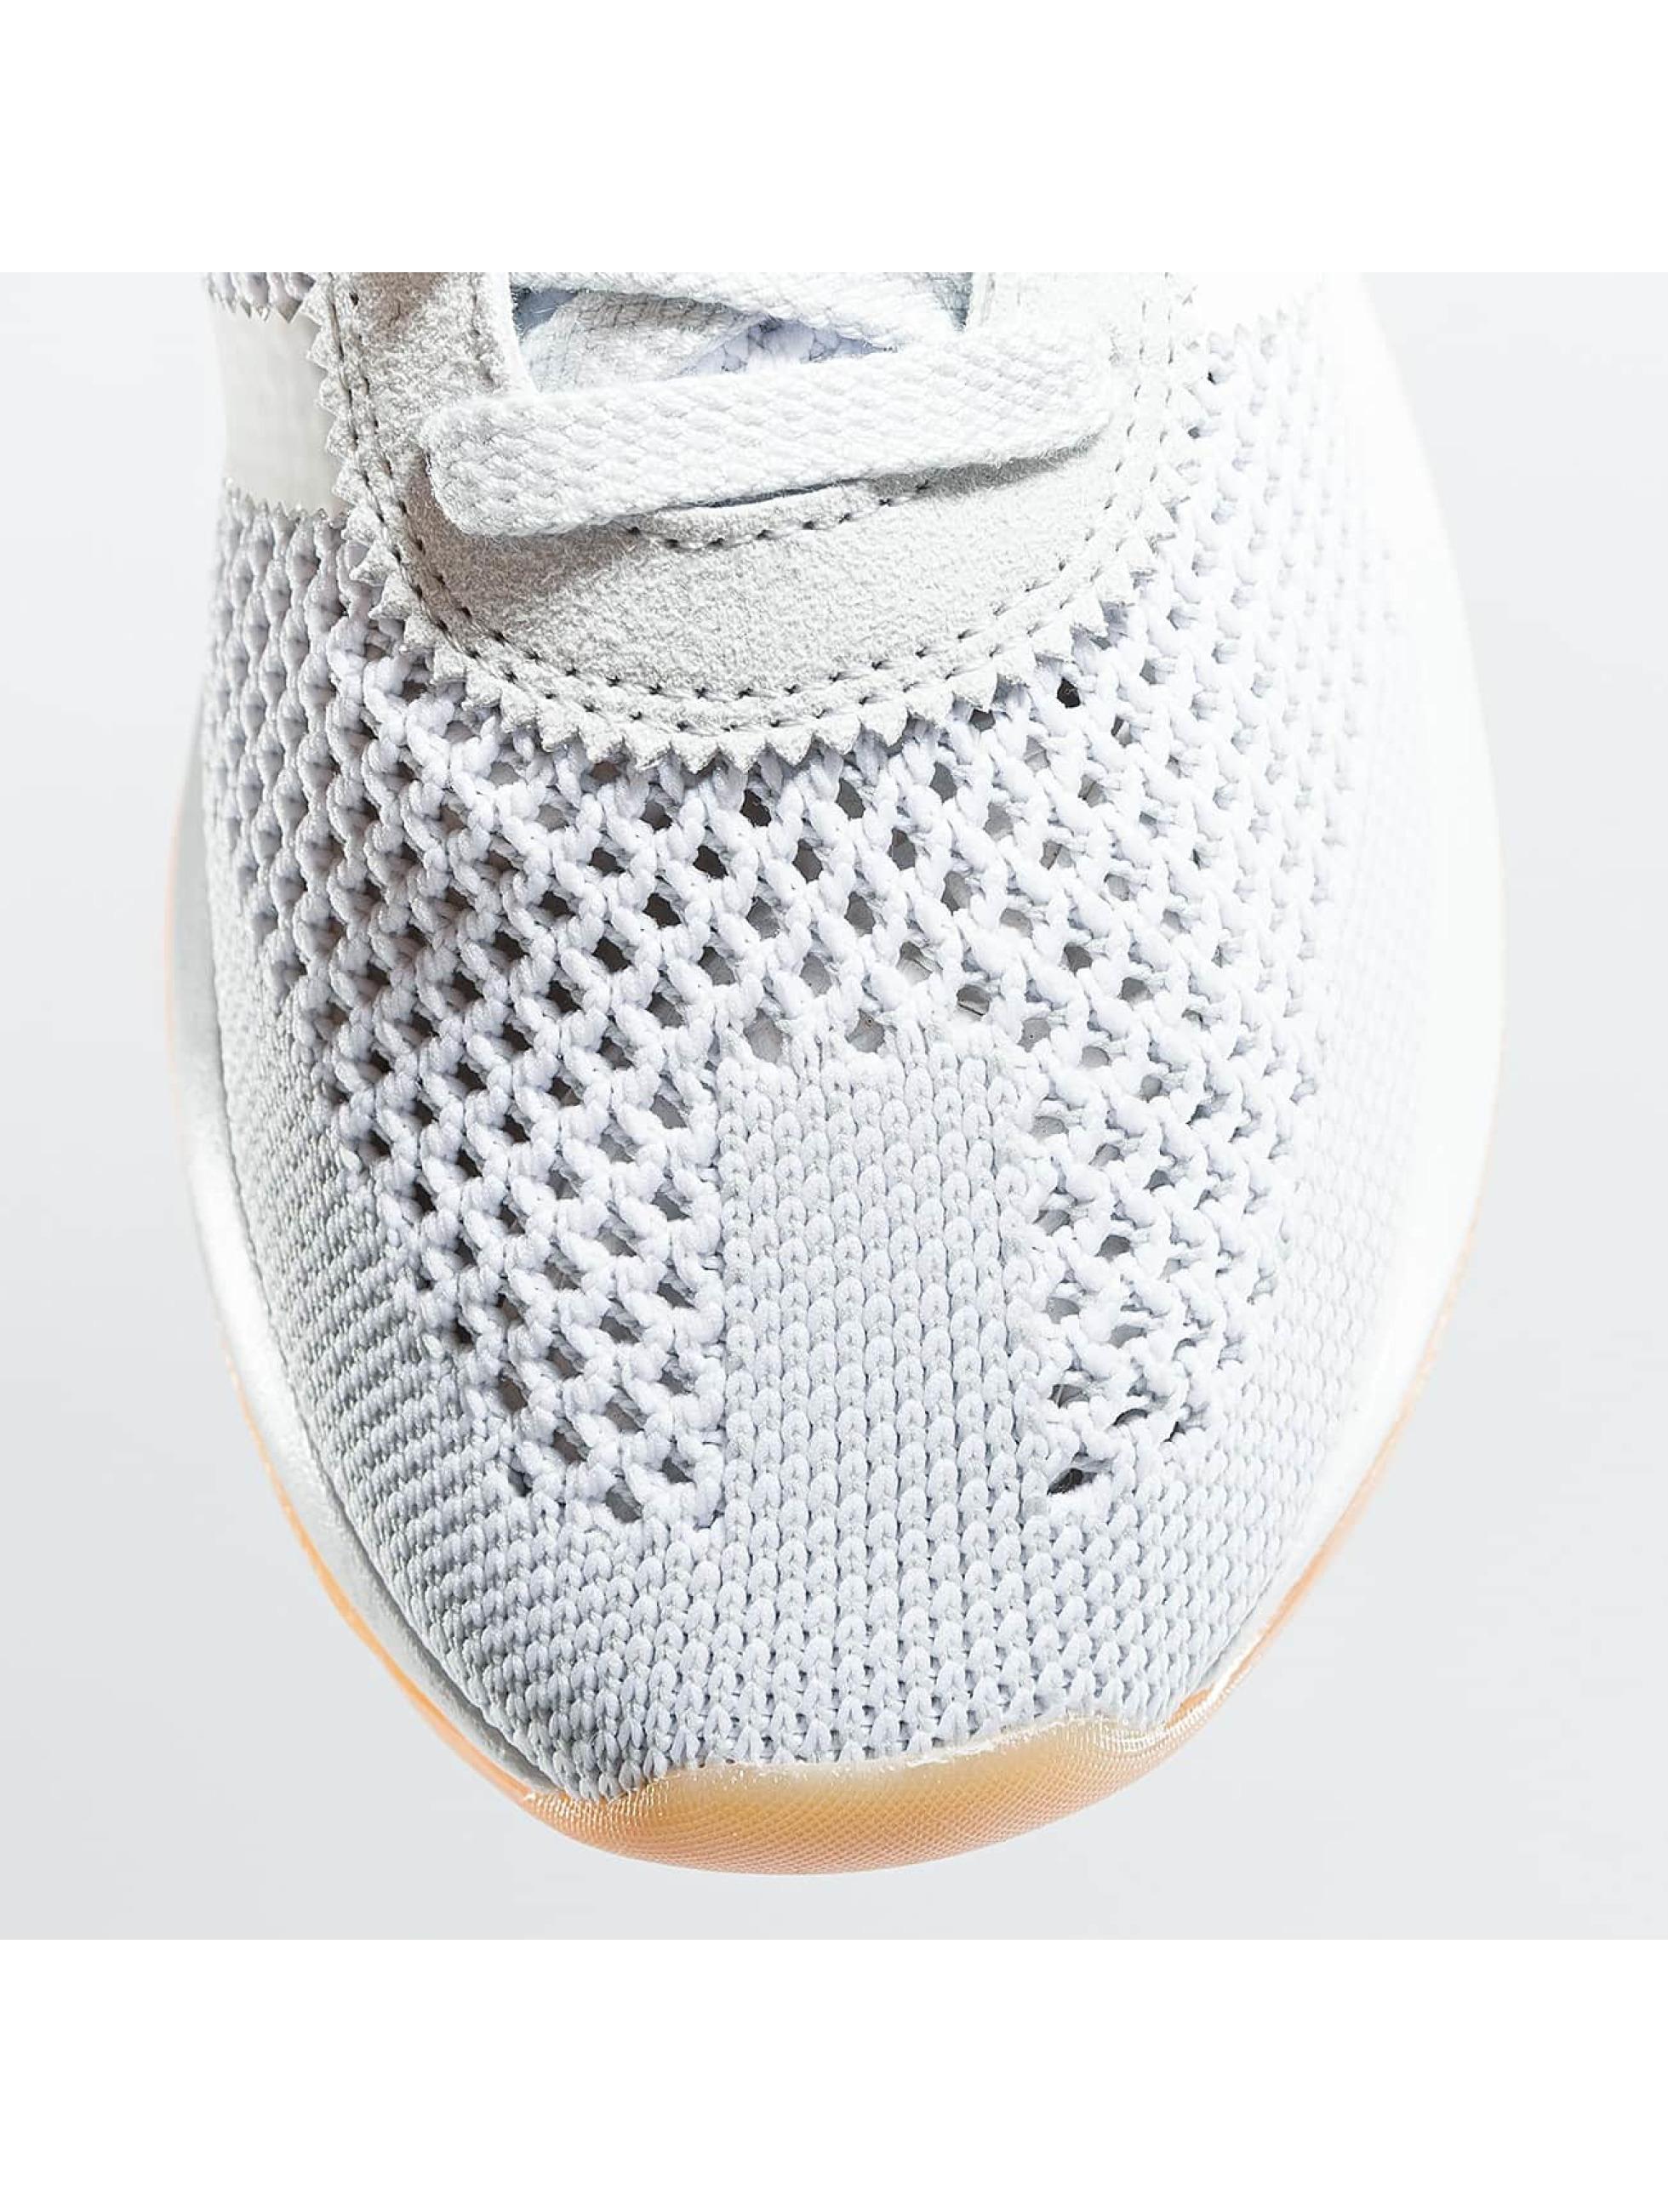 adidas originals Baskets FLB W PK blanc